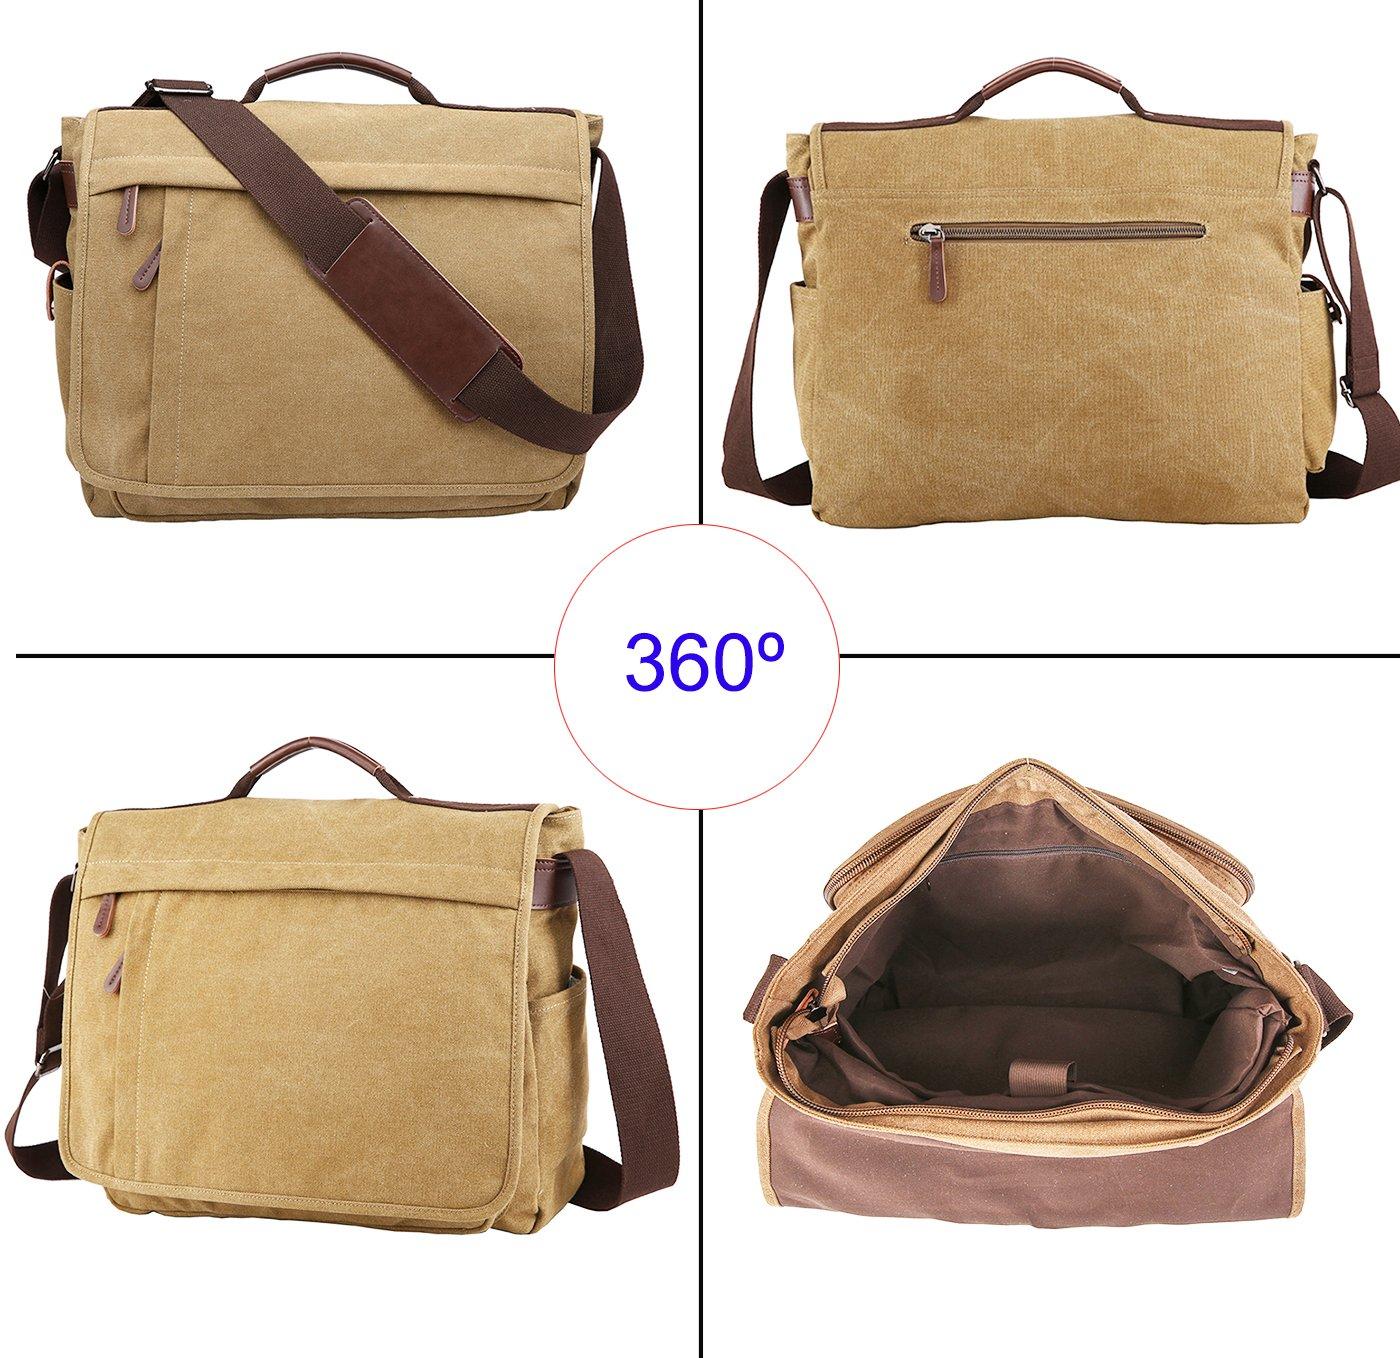 Cute London Guard Cartoon Messenger Bag Crossbody Bag Large Durable Shoulder School Or Business Bag Oxford Fabric For Mens Womens